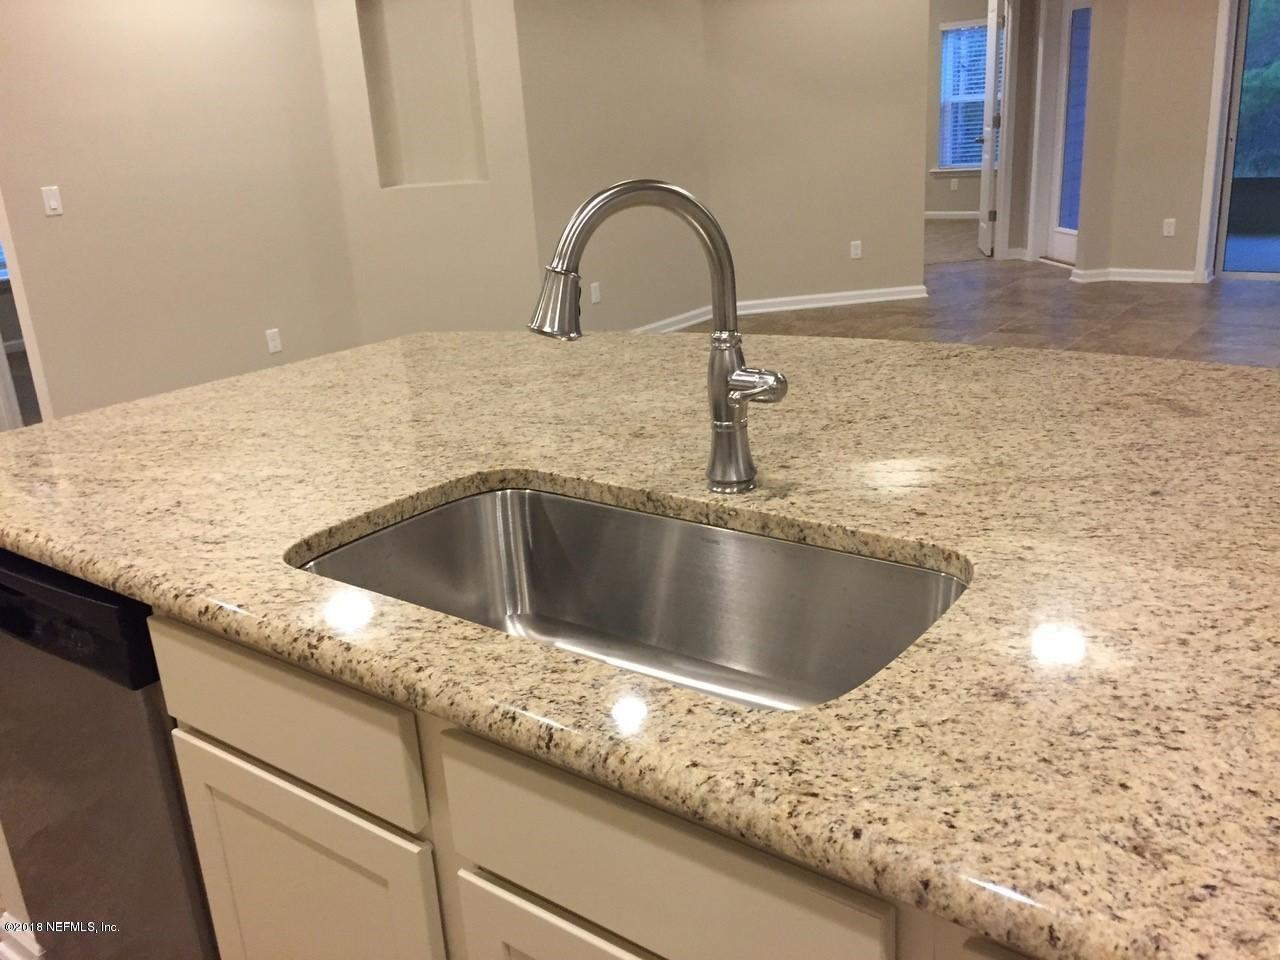 188 HAAS, ST AUGUSTINE, FLORIDA 32095, 3 Bedrooms Bedrooms, ,3 BathroomsBathrooms,Residential - single family,For sale,HAAS,931383